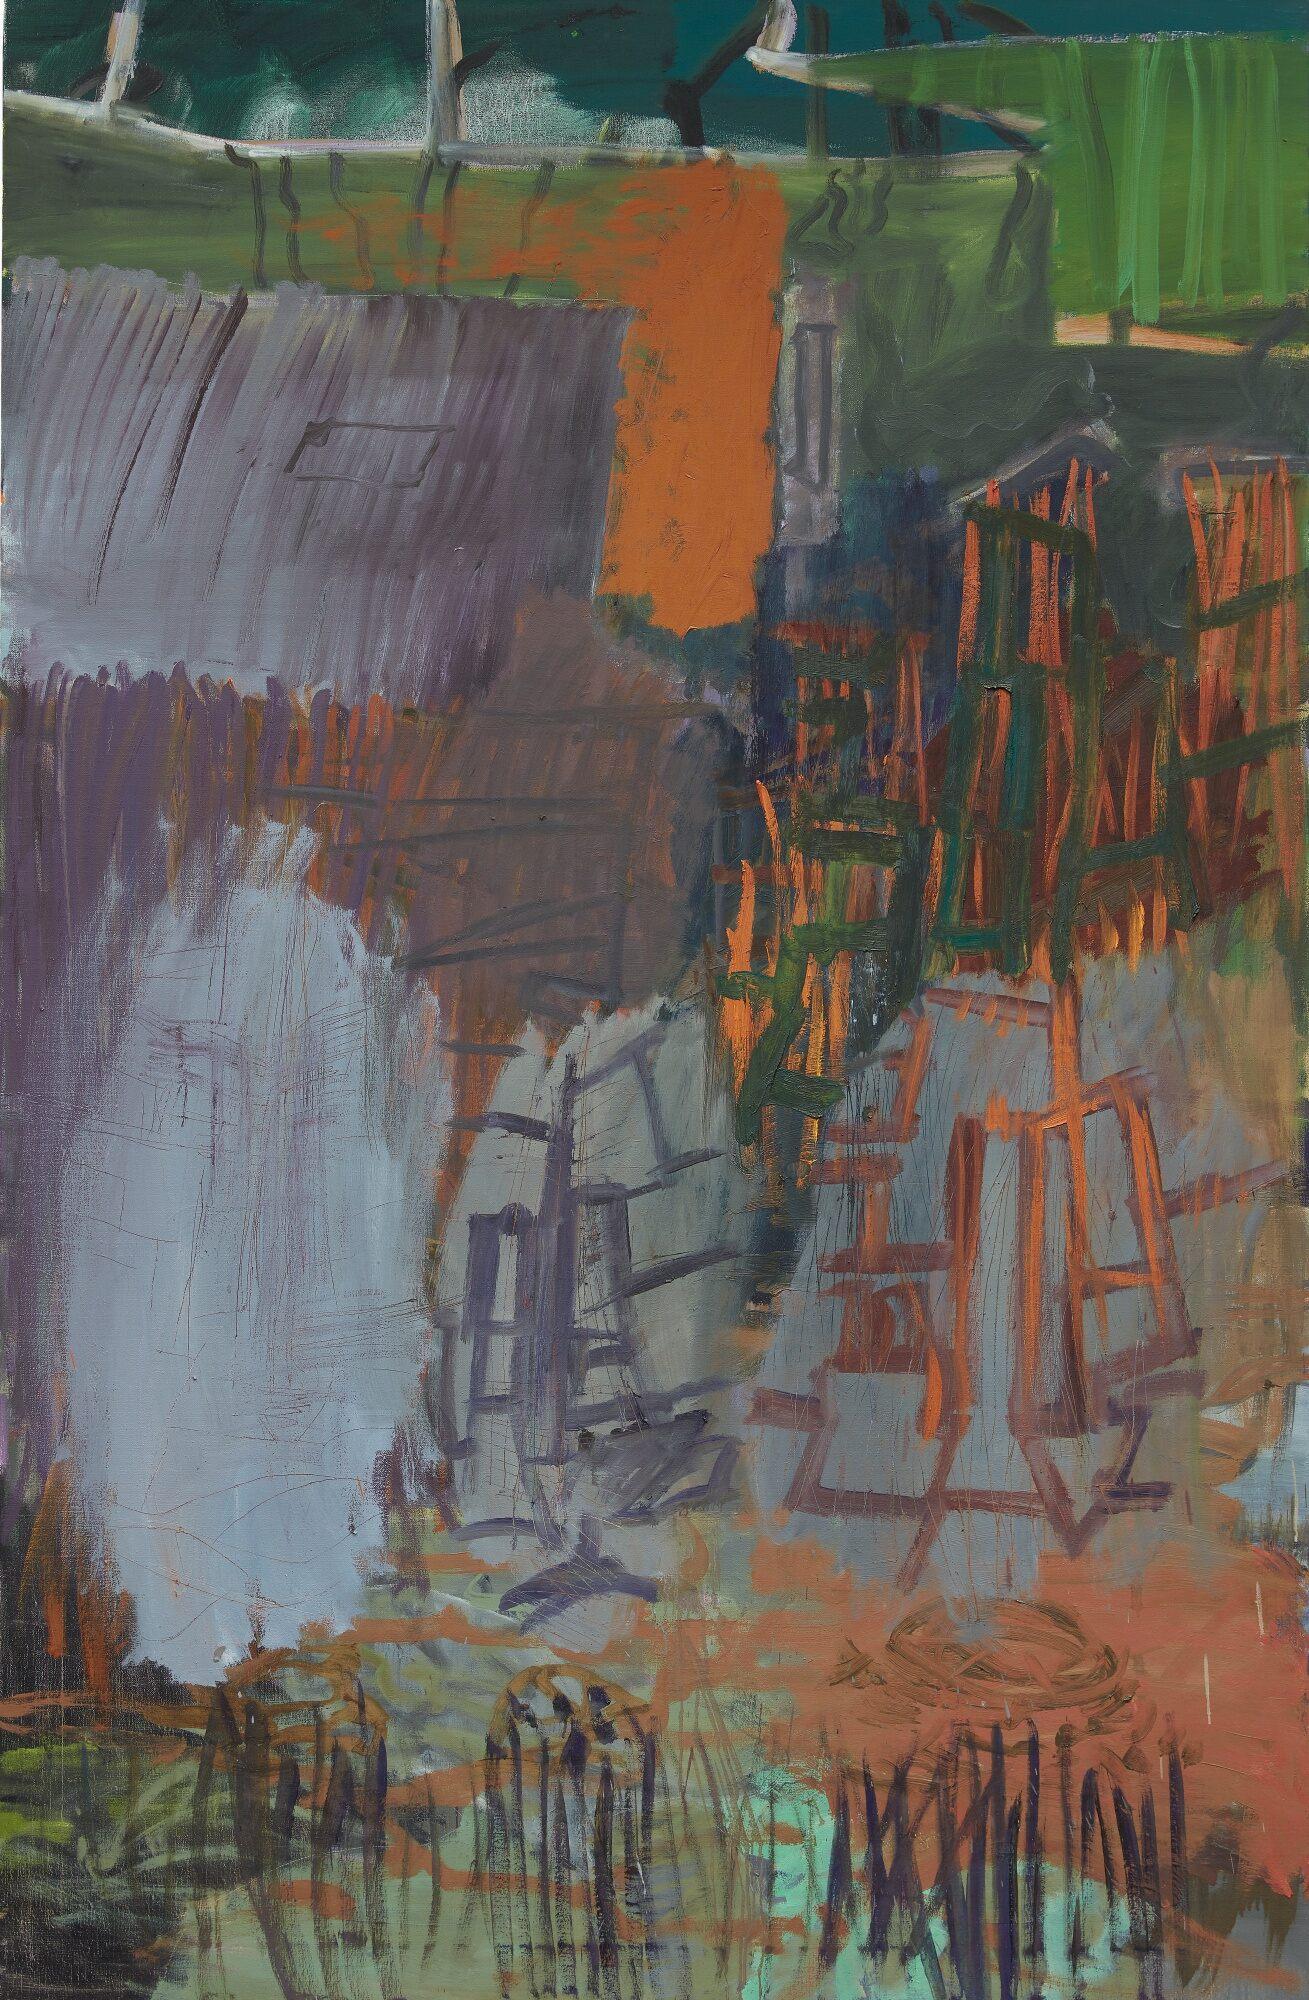 Kirkeby INFERNO VII, 1993 Öl auf Leinwand 198 x 130 cm © Per Kirkeby Estate Foto: Stefan Korte